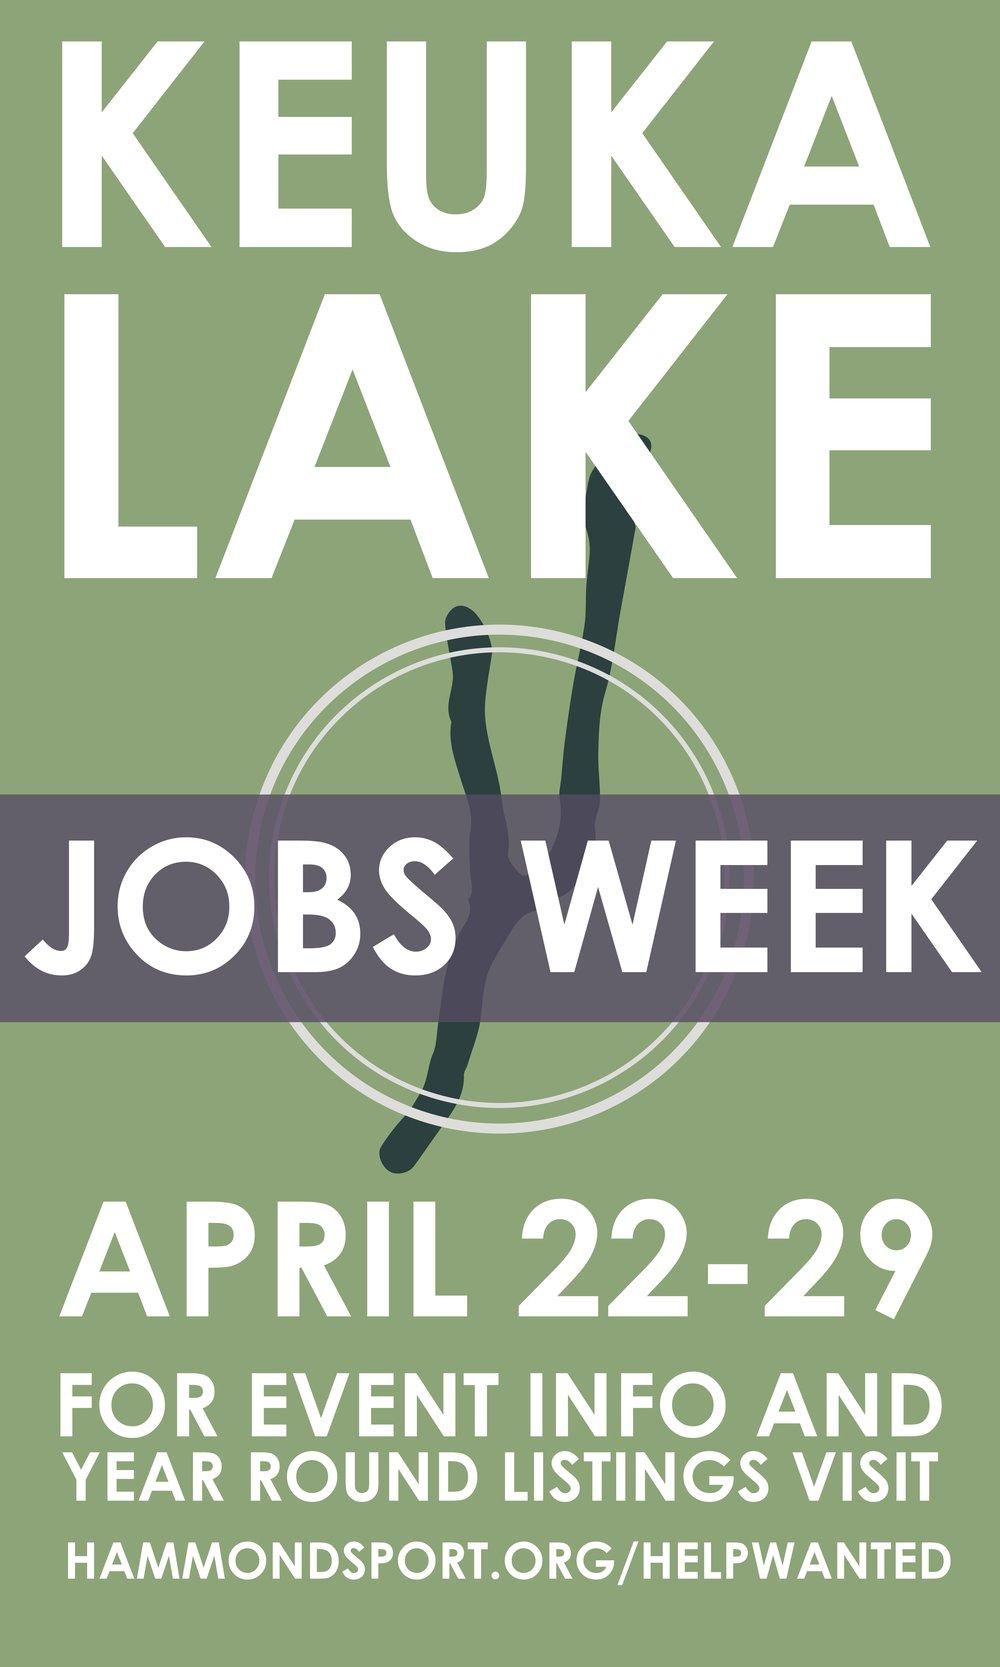 Check back on April 22nd for job listings!